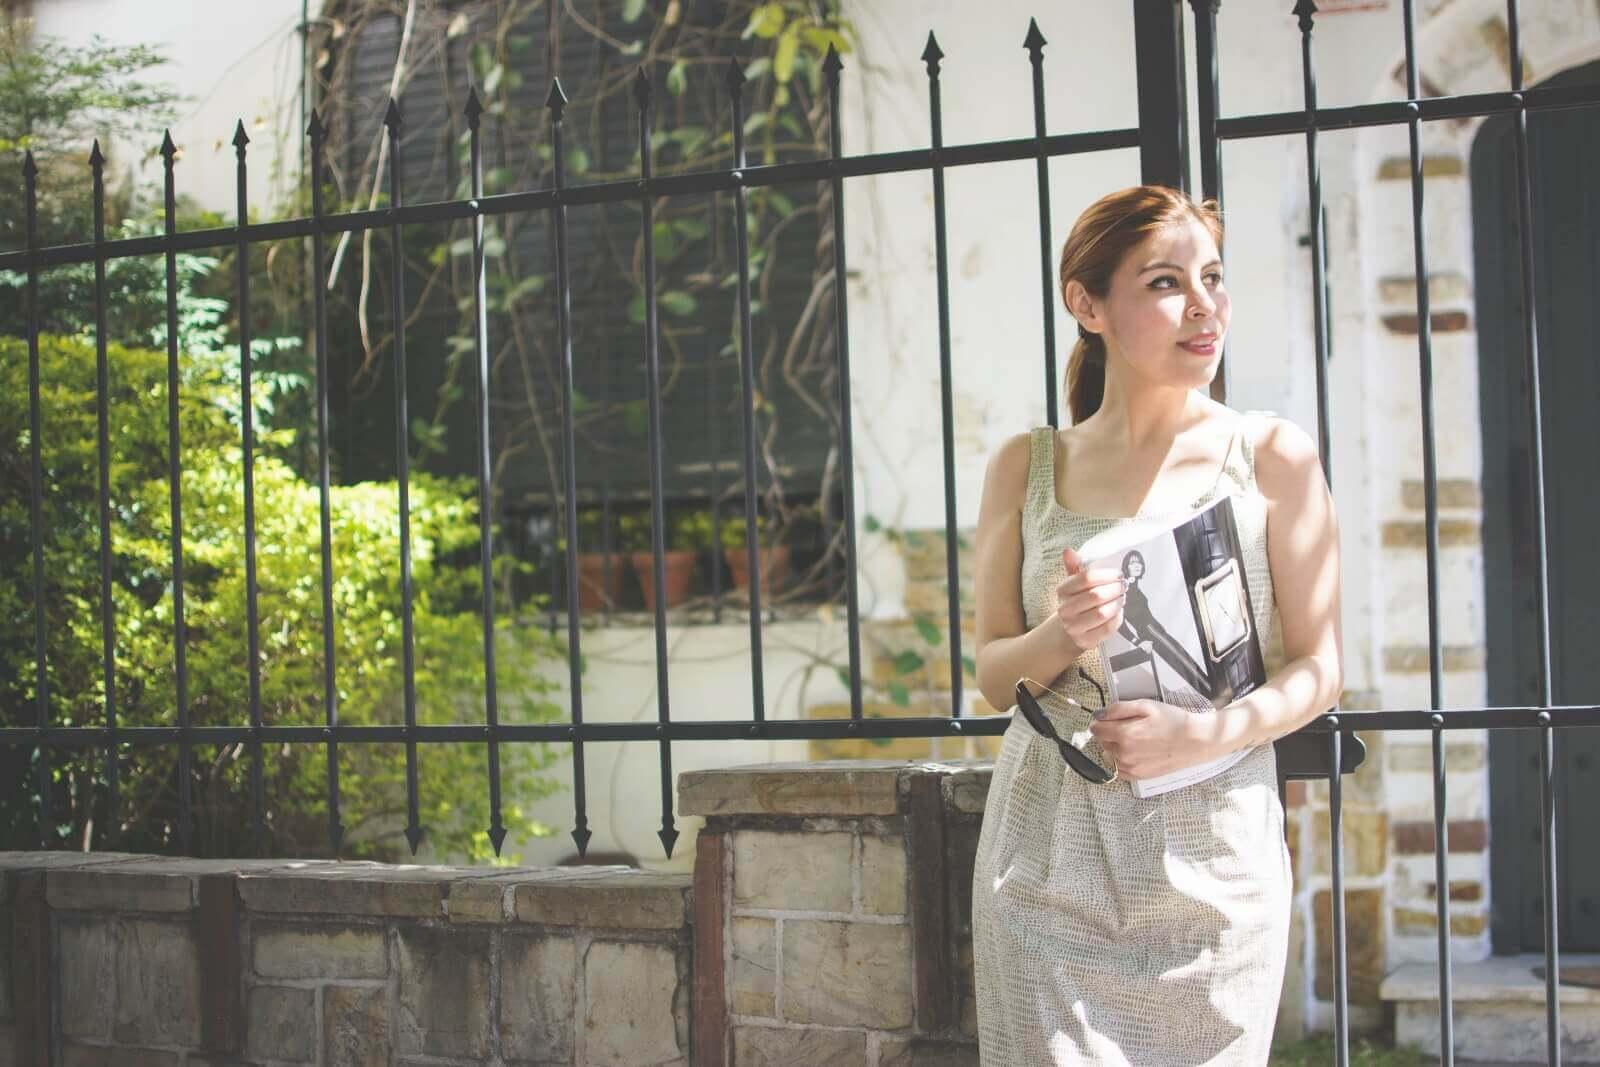 almond-white-dress-sammydress-stilettos-valentino-rockstud-imitation-deborah-ferrero-style-by-deb-ladylike14